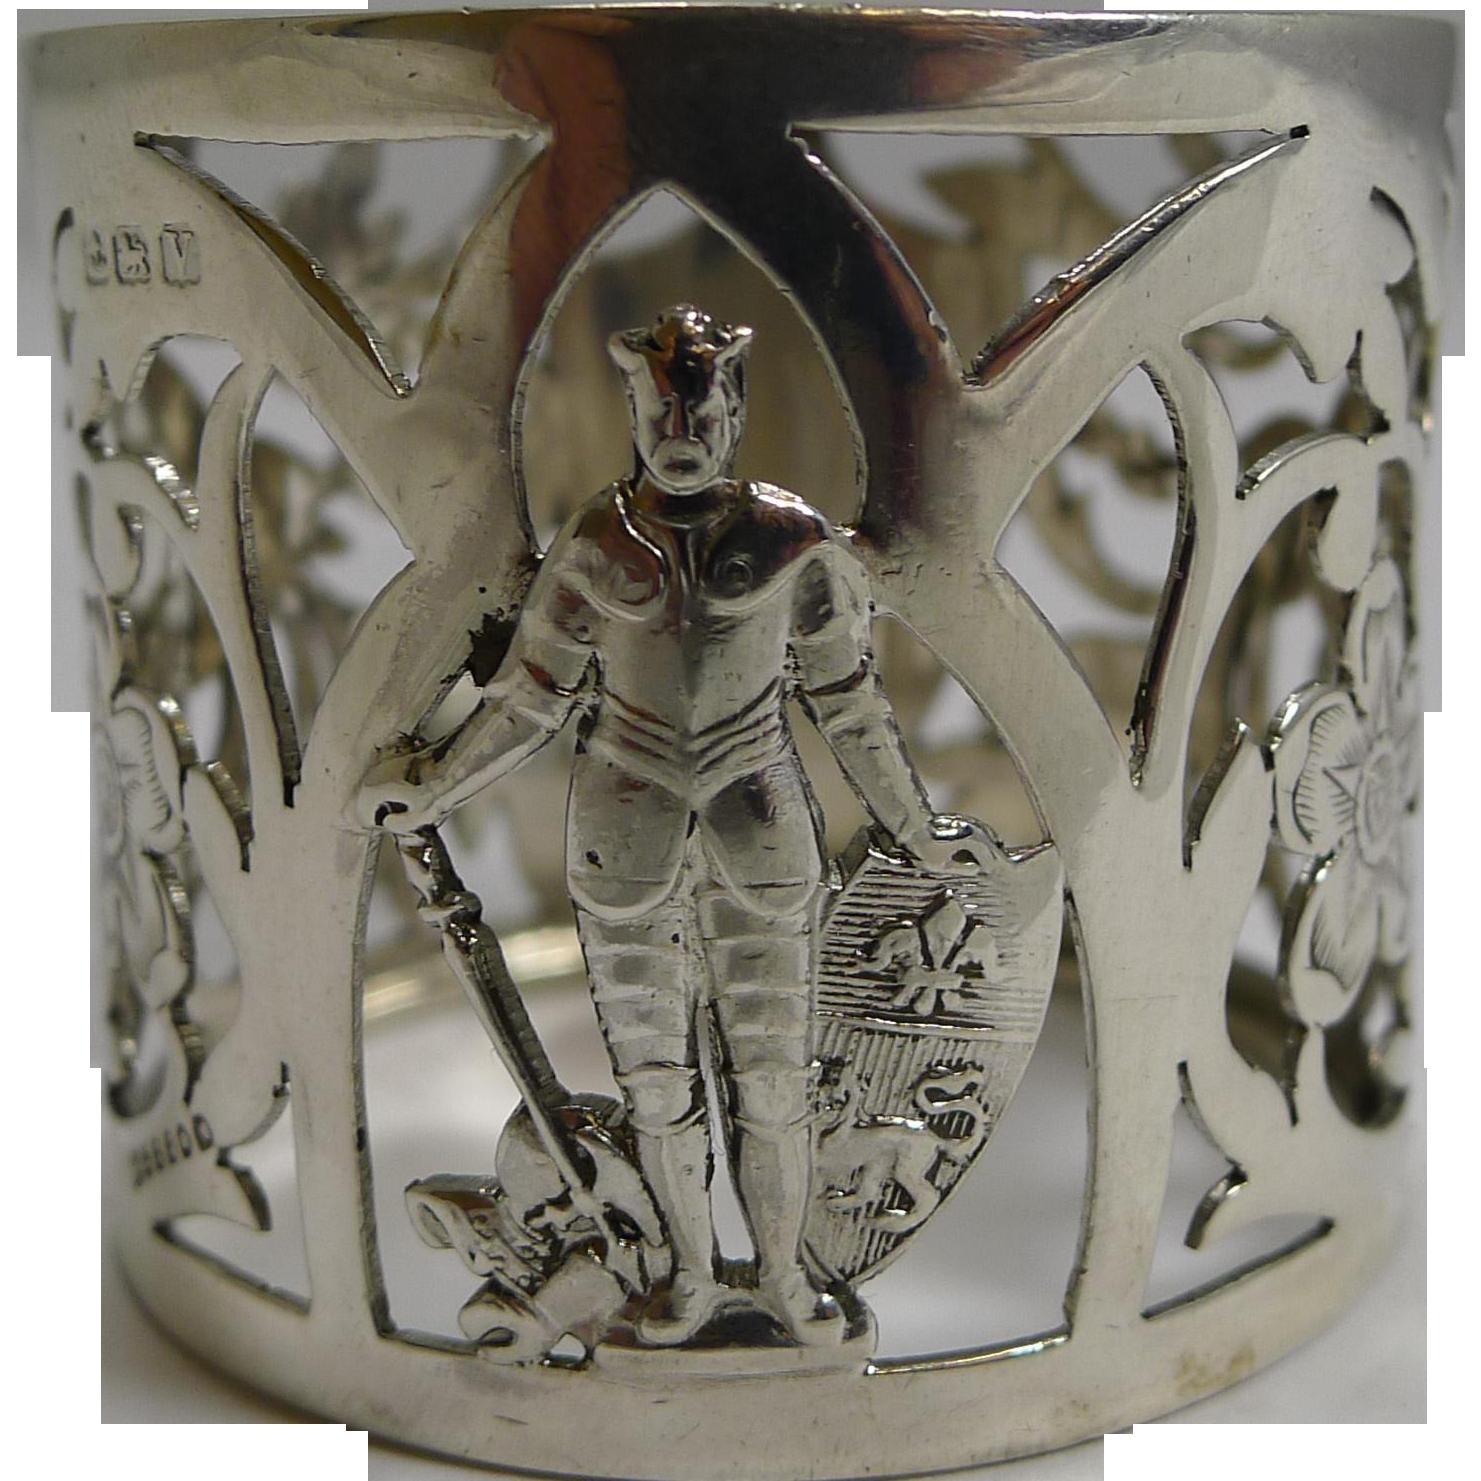 Unusual Vintage Sterling Silver Figural Napkin Ring - 1920